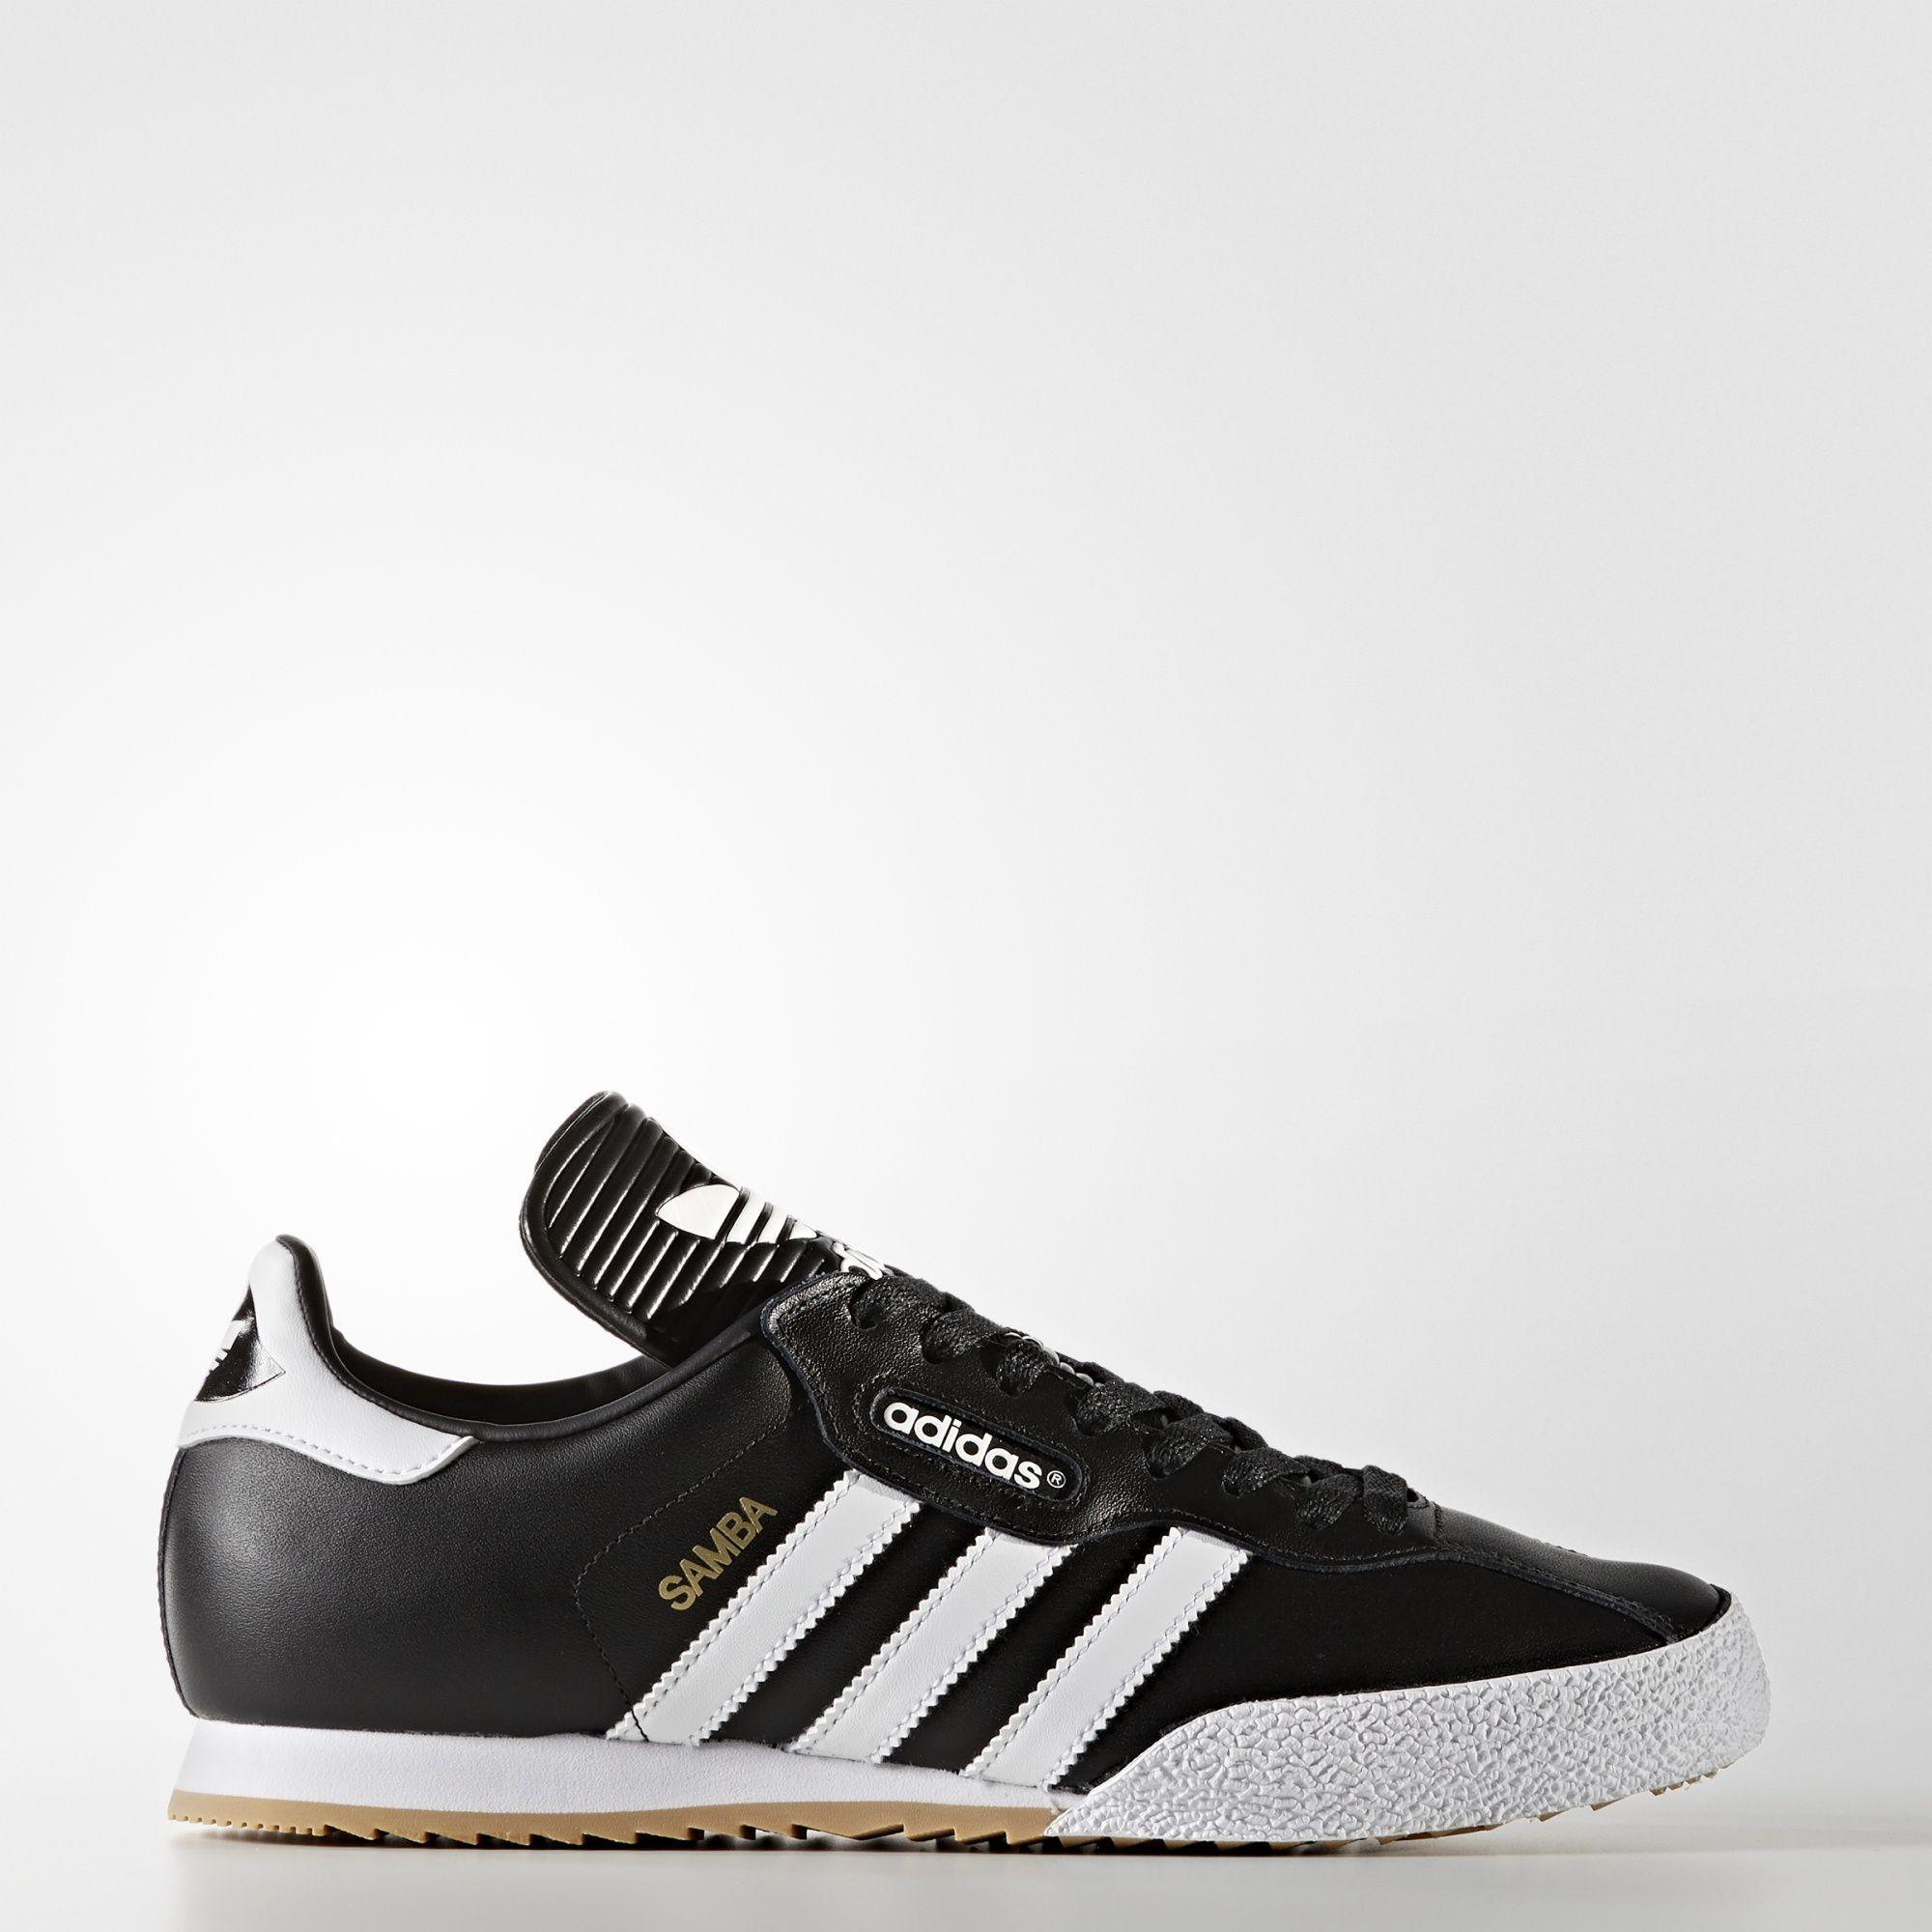 743f5104c35d adidas Samba Super Shoes in Black - Lyst